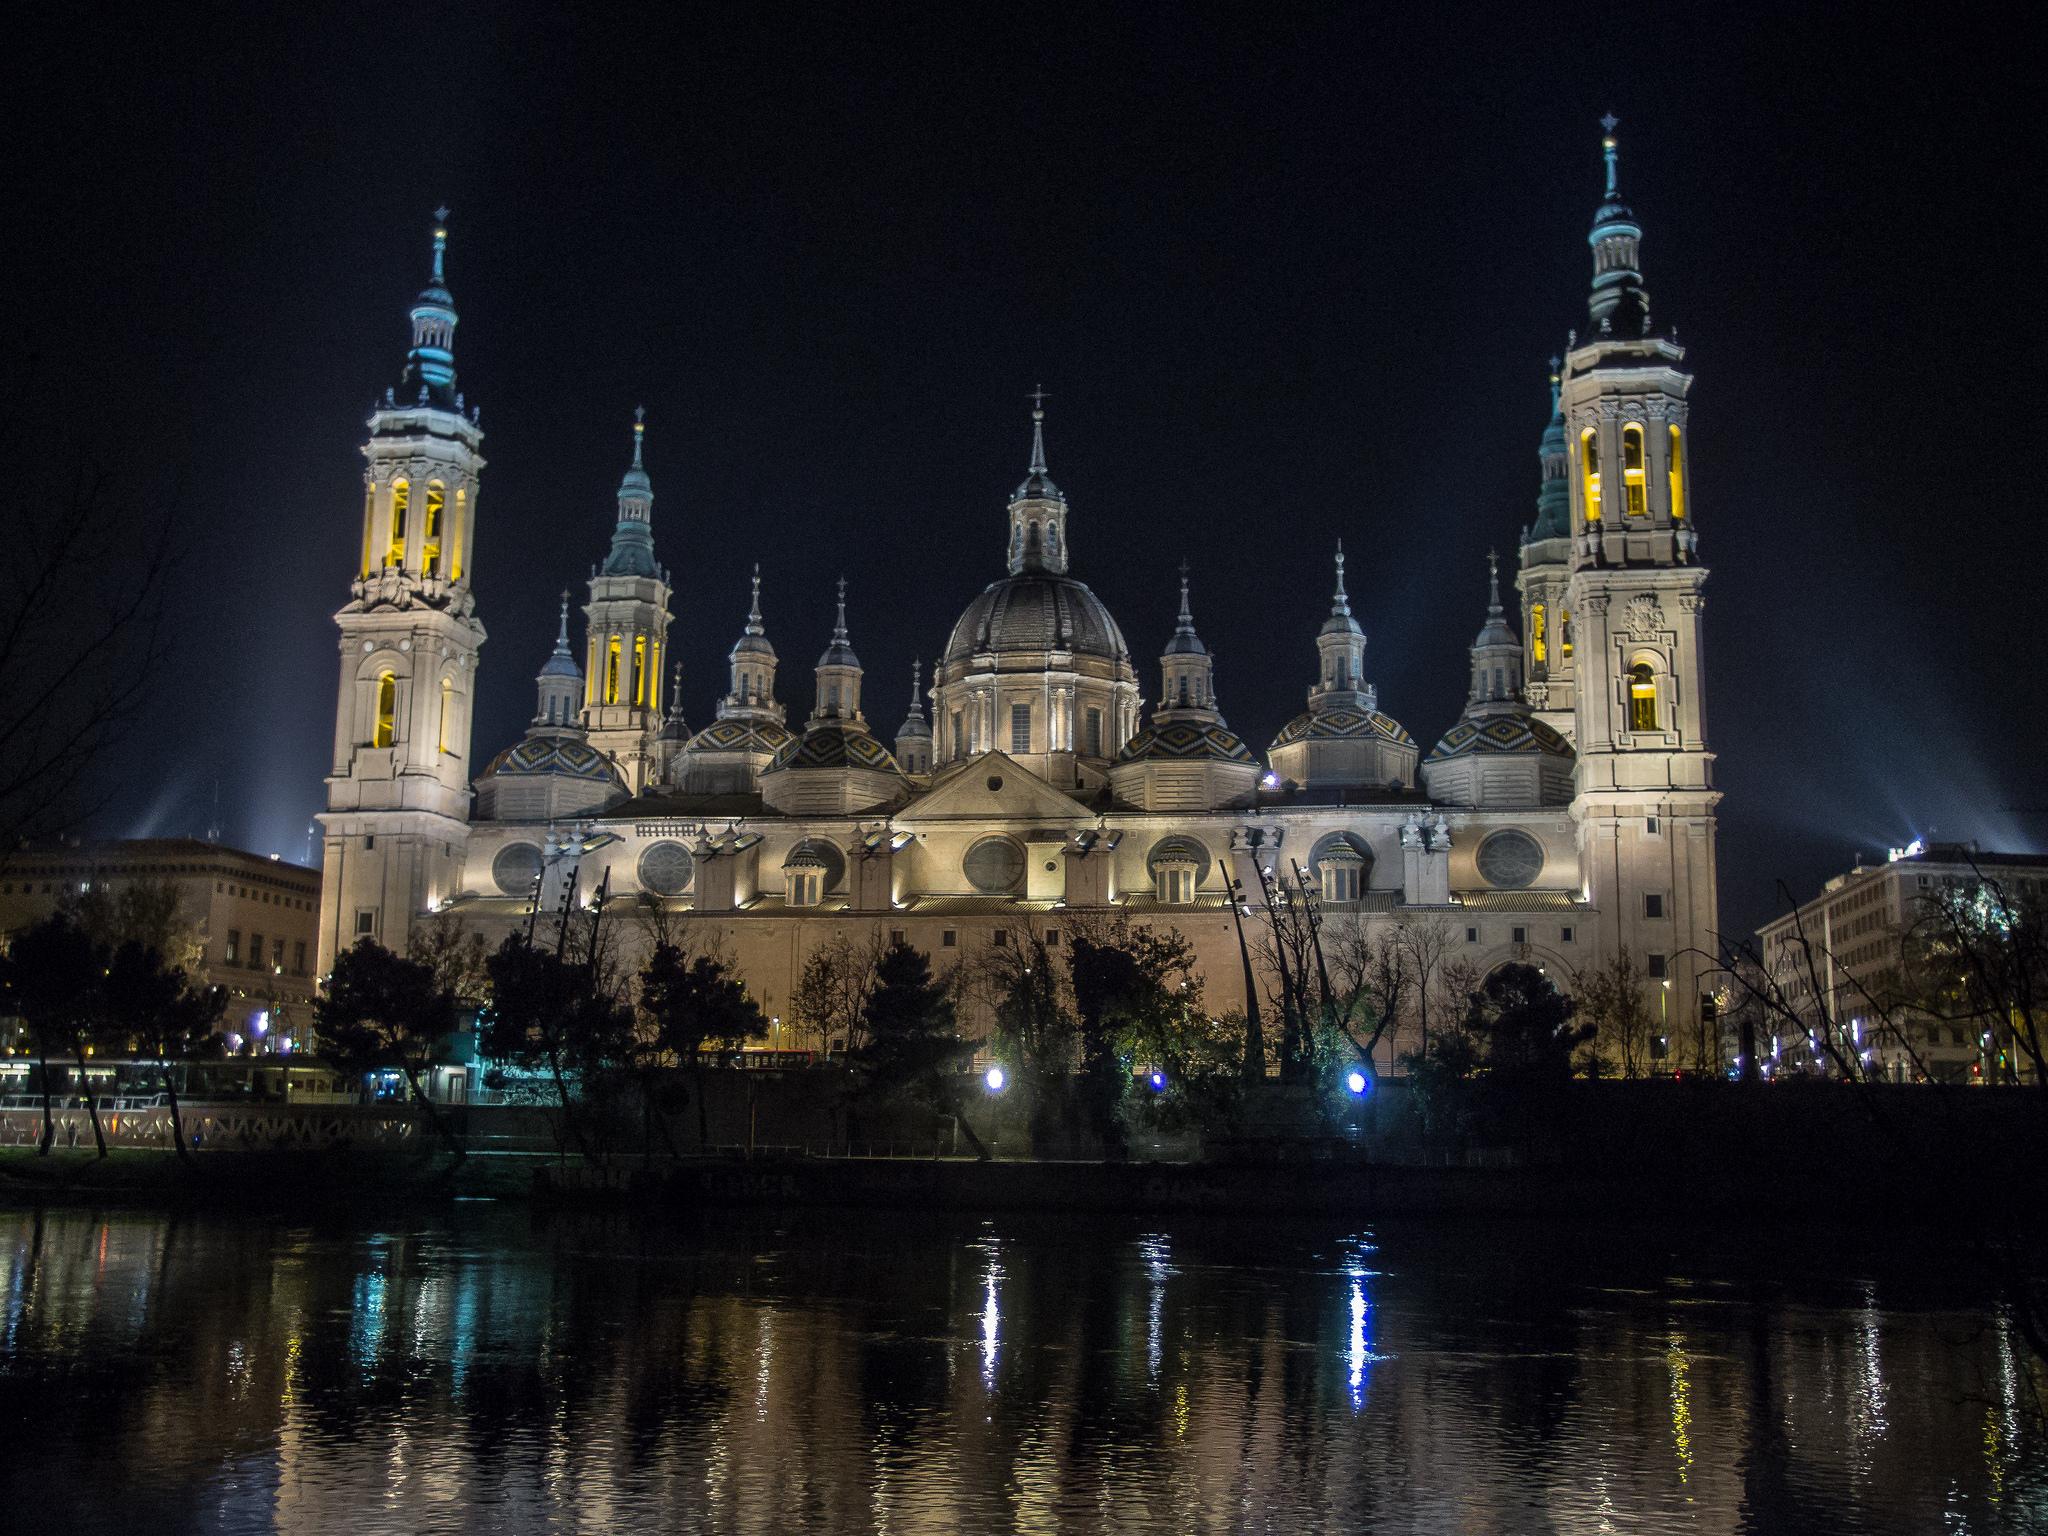 Basílica de El Pilar Zaragoza